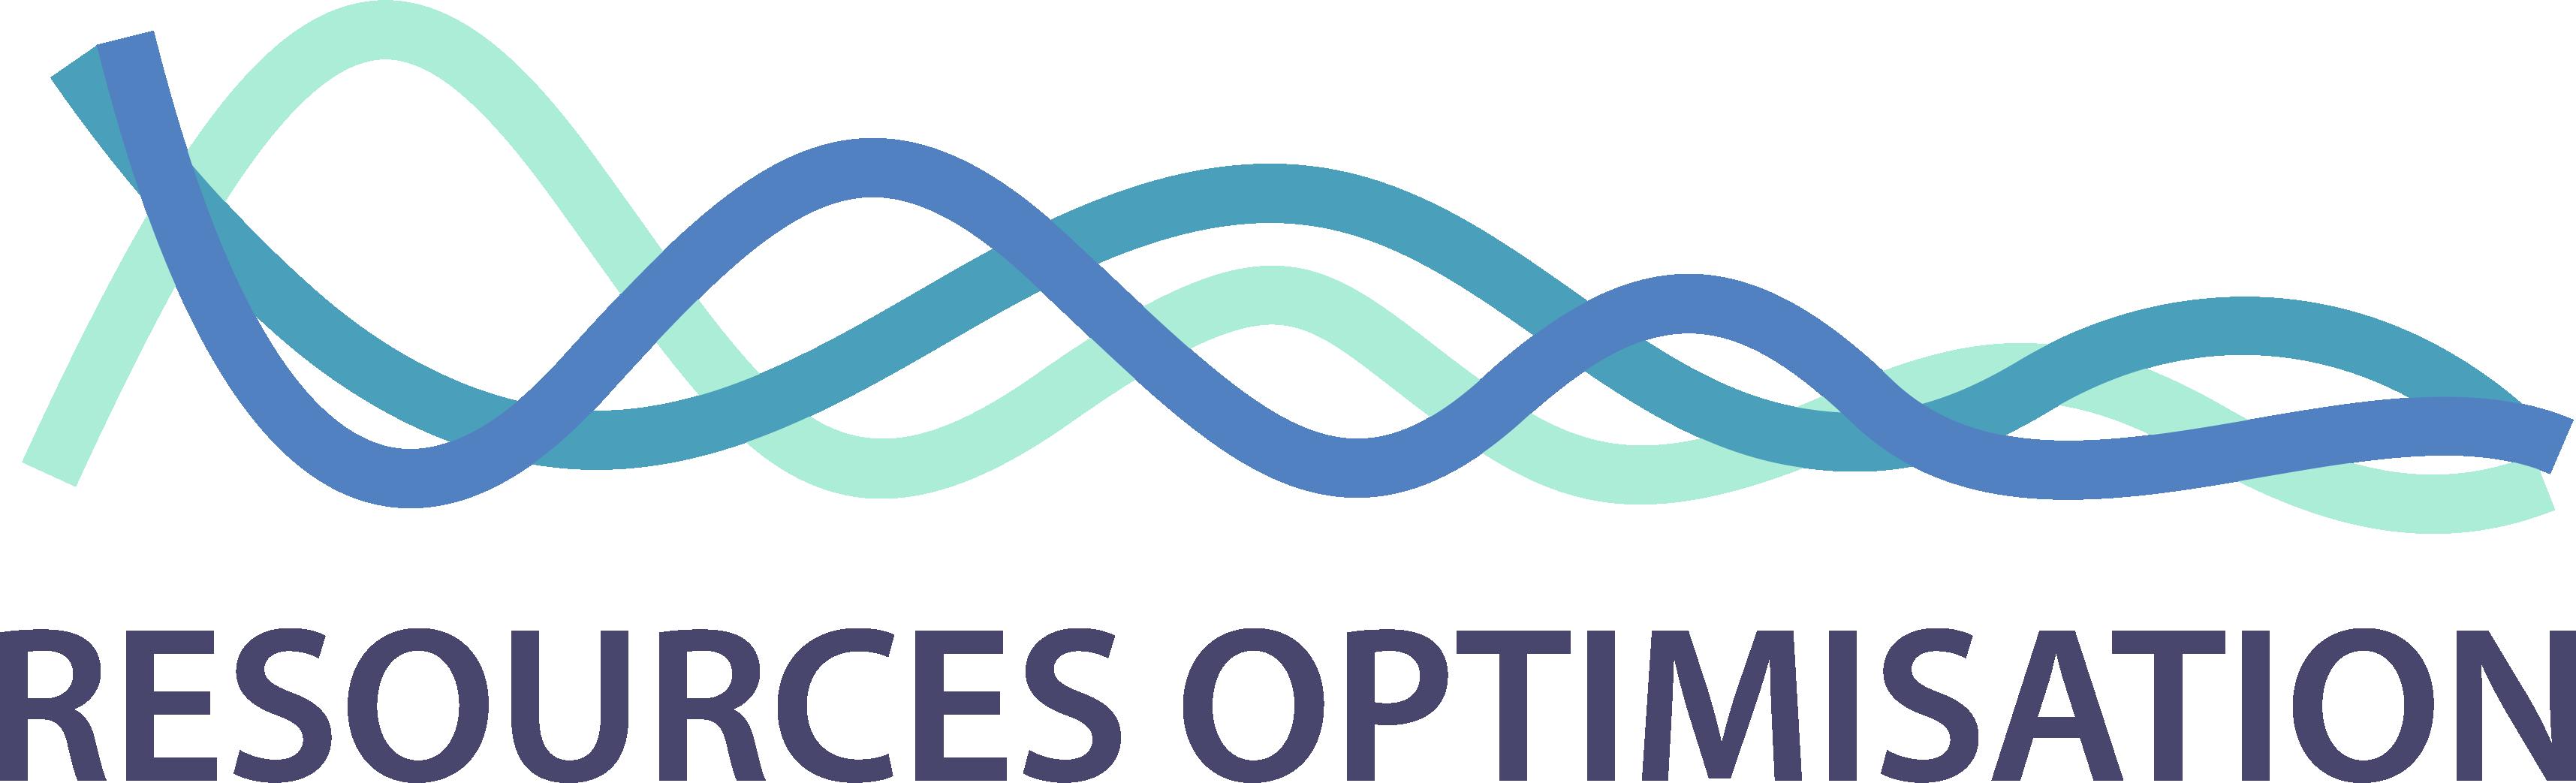 Resources Optimisation